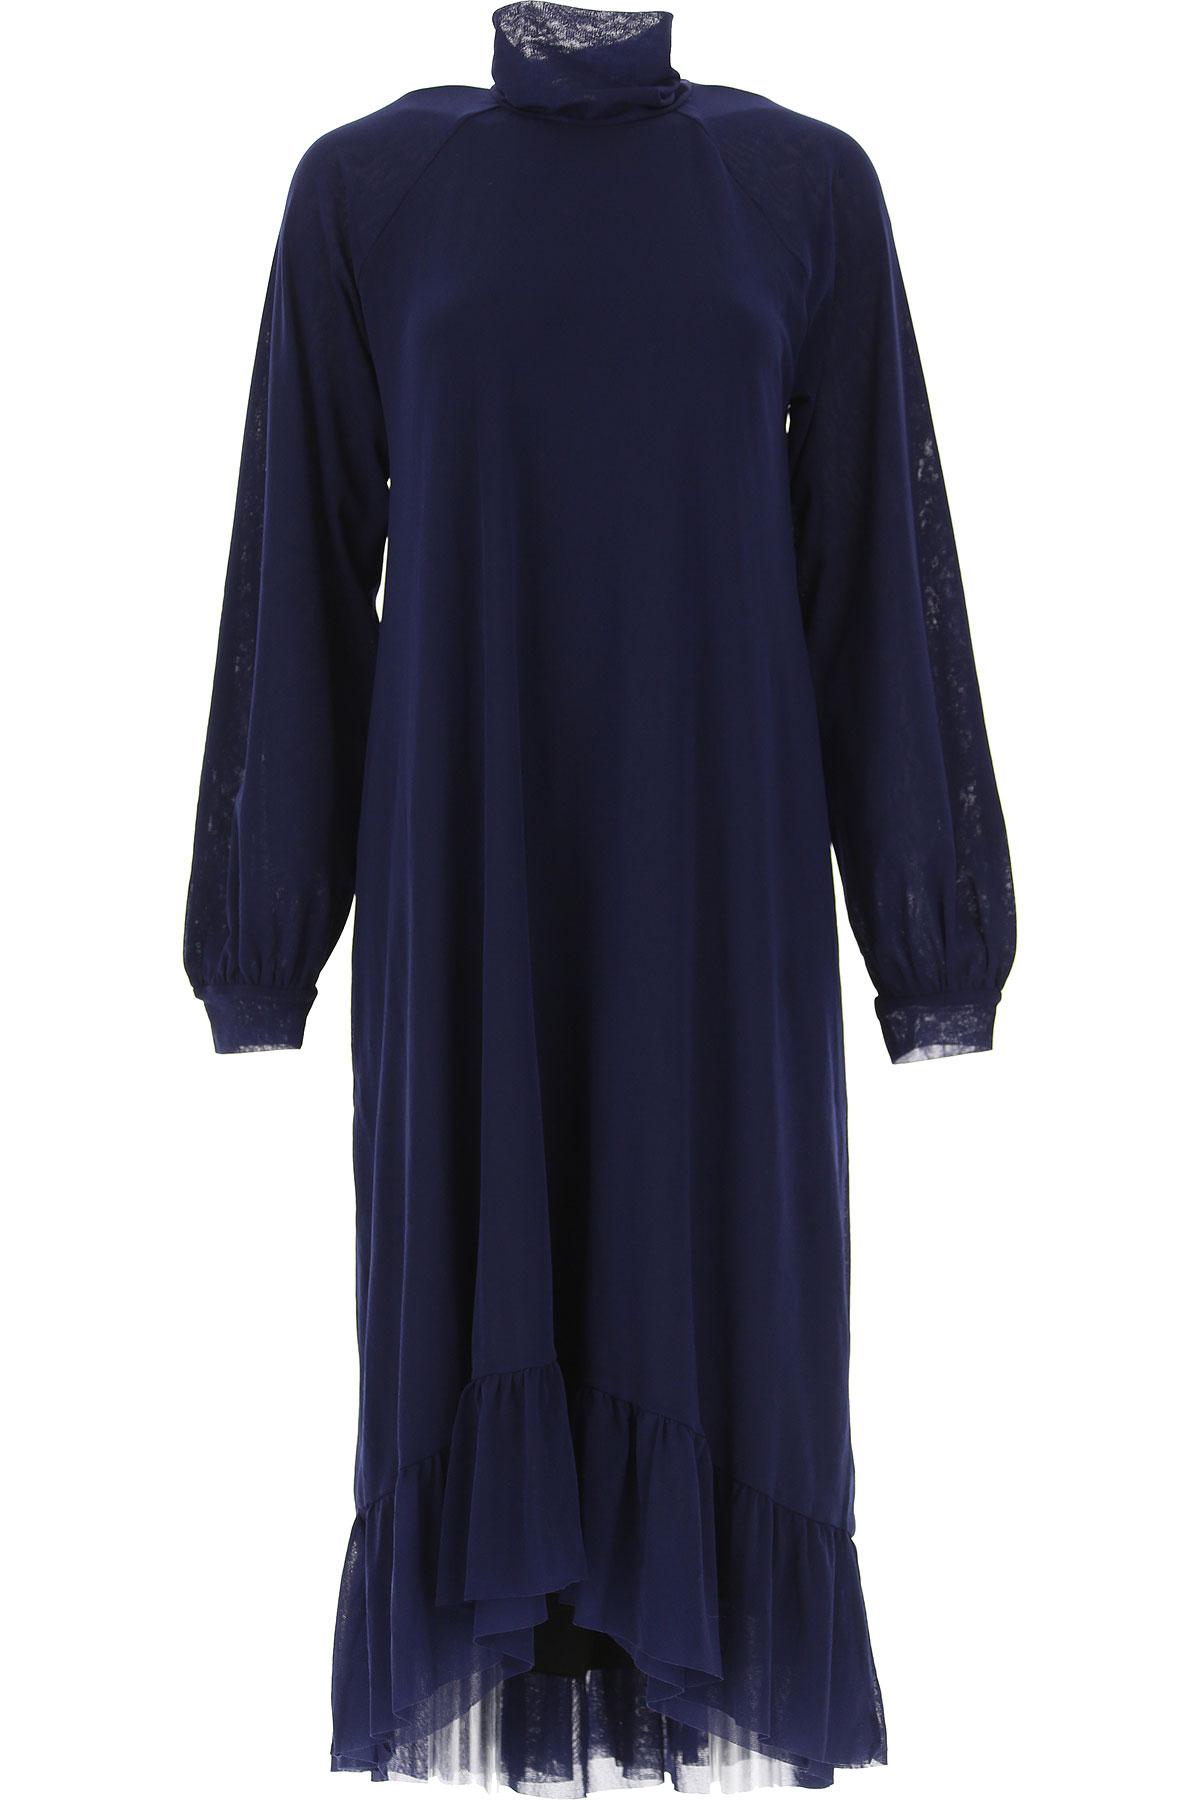 Fuzzi Dress for Women, Evening Cocktail Party On Sale, Dark Blue, polyamide, 2019, 4 6 8